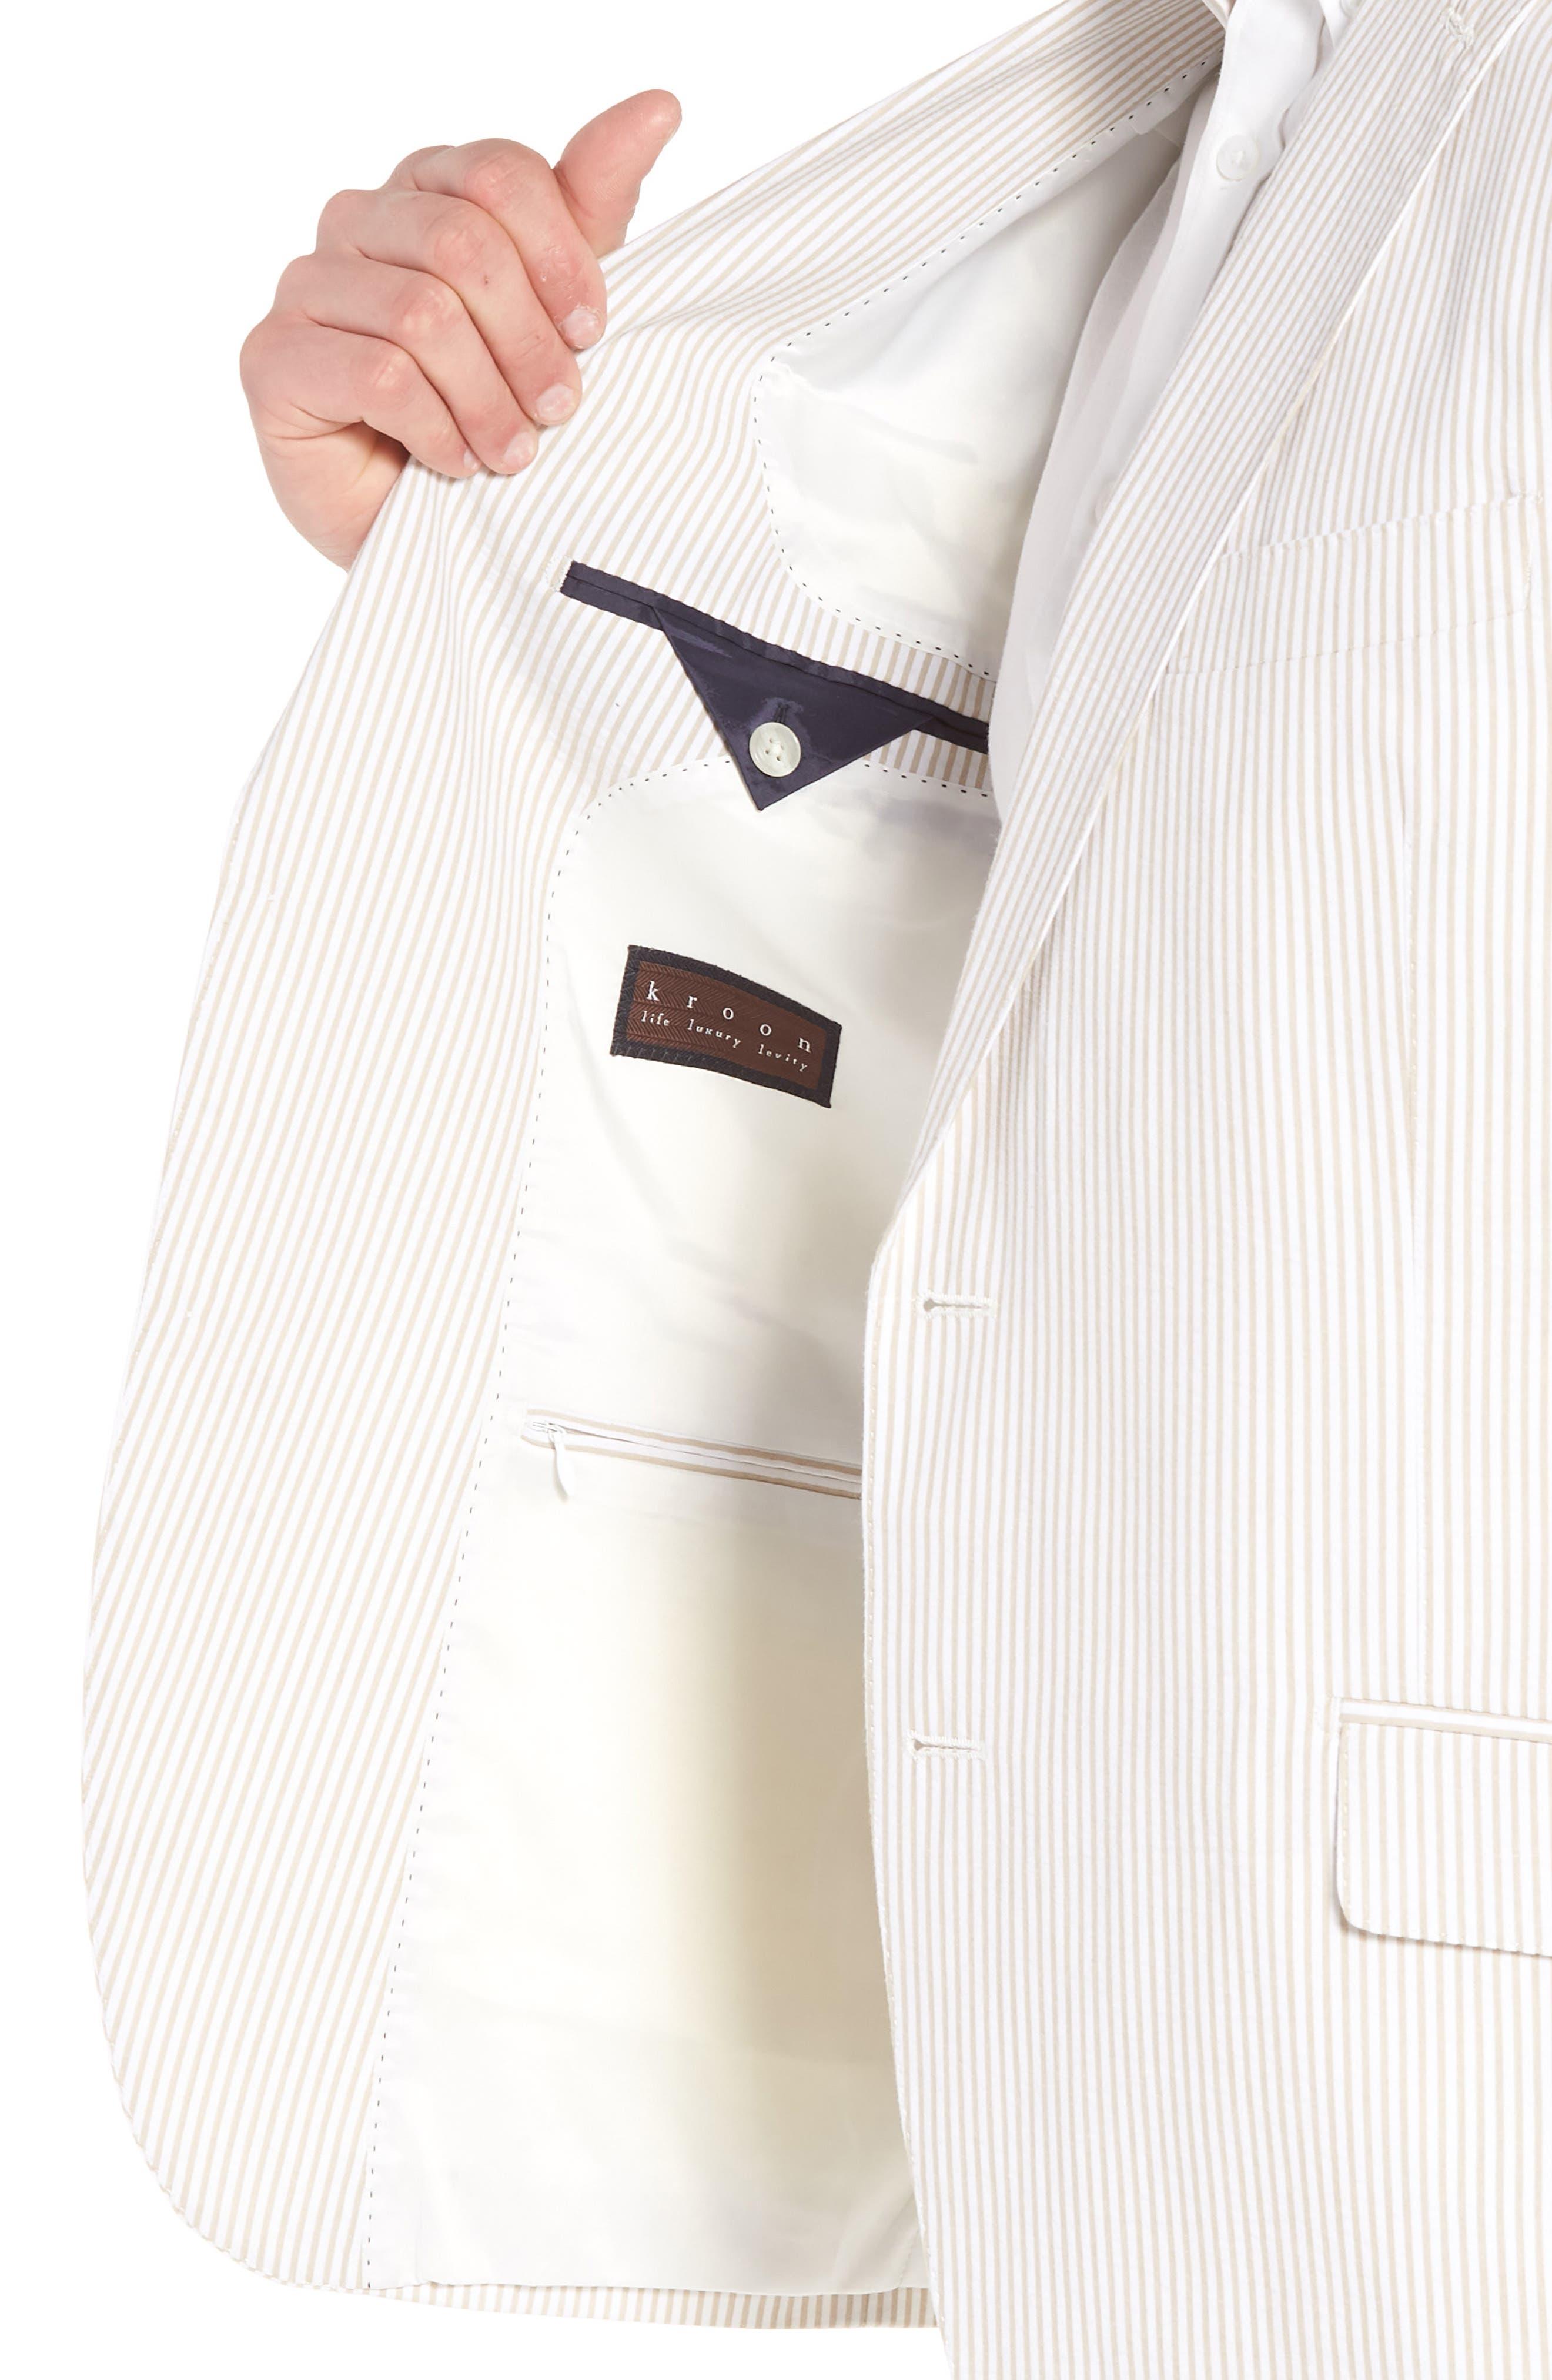 Jack AIM Classic Fit Seersucker Sport Coat,                             Alternate thumbnail 4, color,                             Tan And White